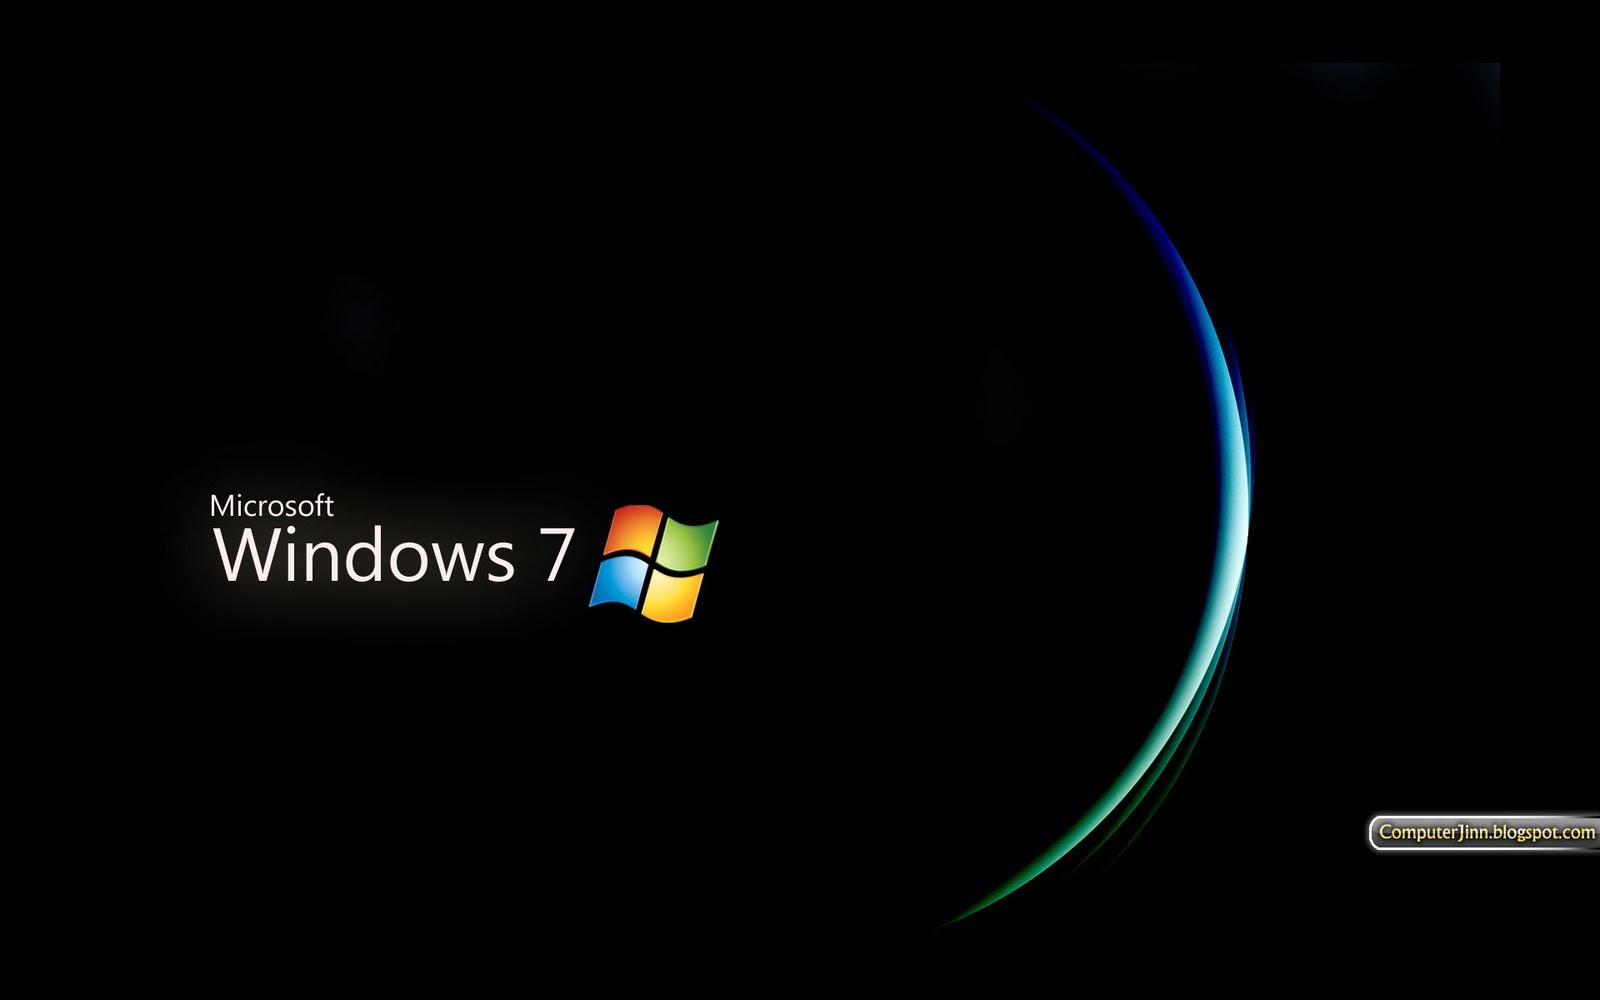 50 Hd Windows 7 Wallpaper Dark On Wallpapersafari